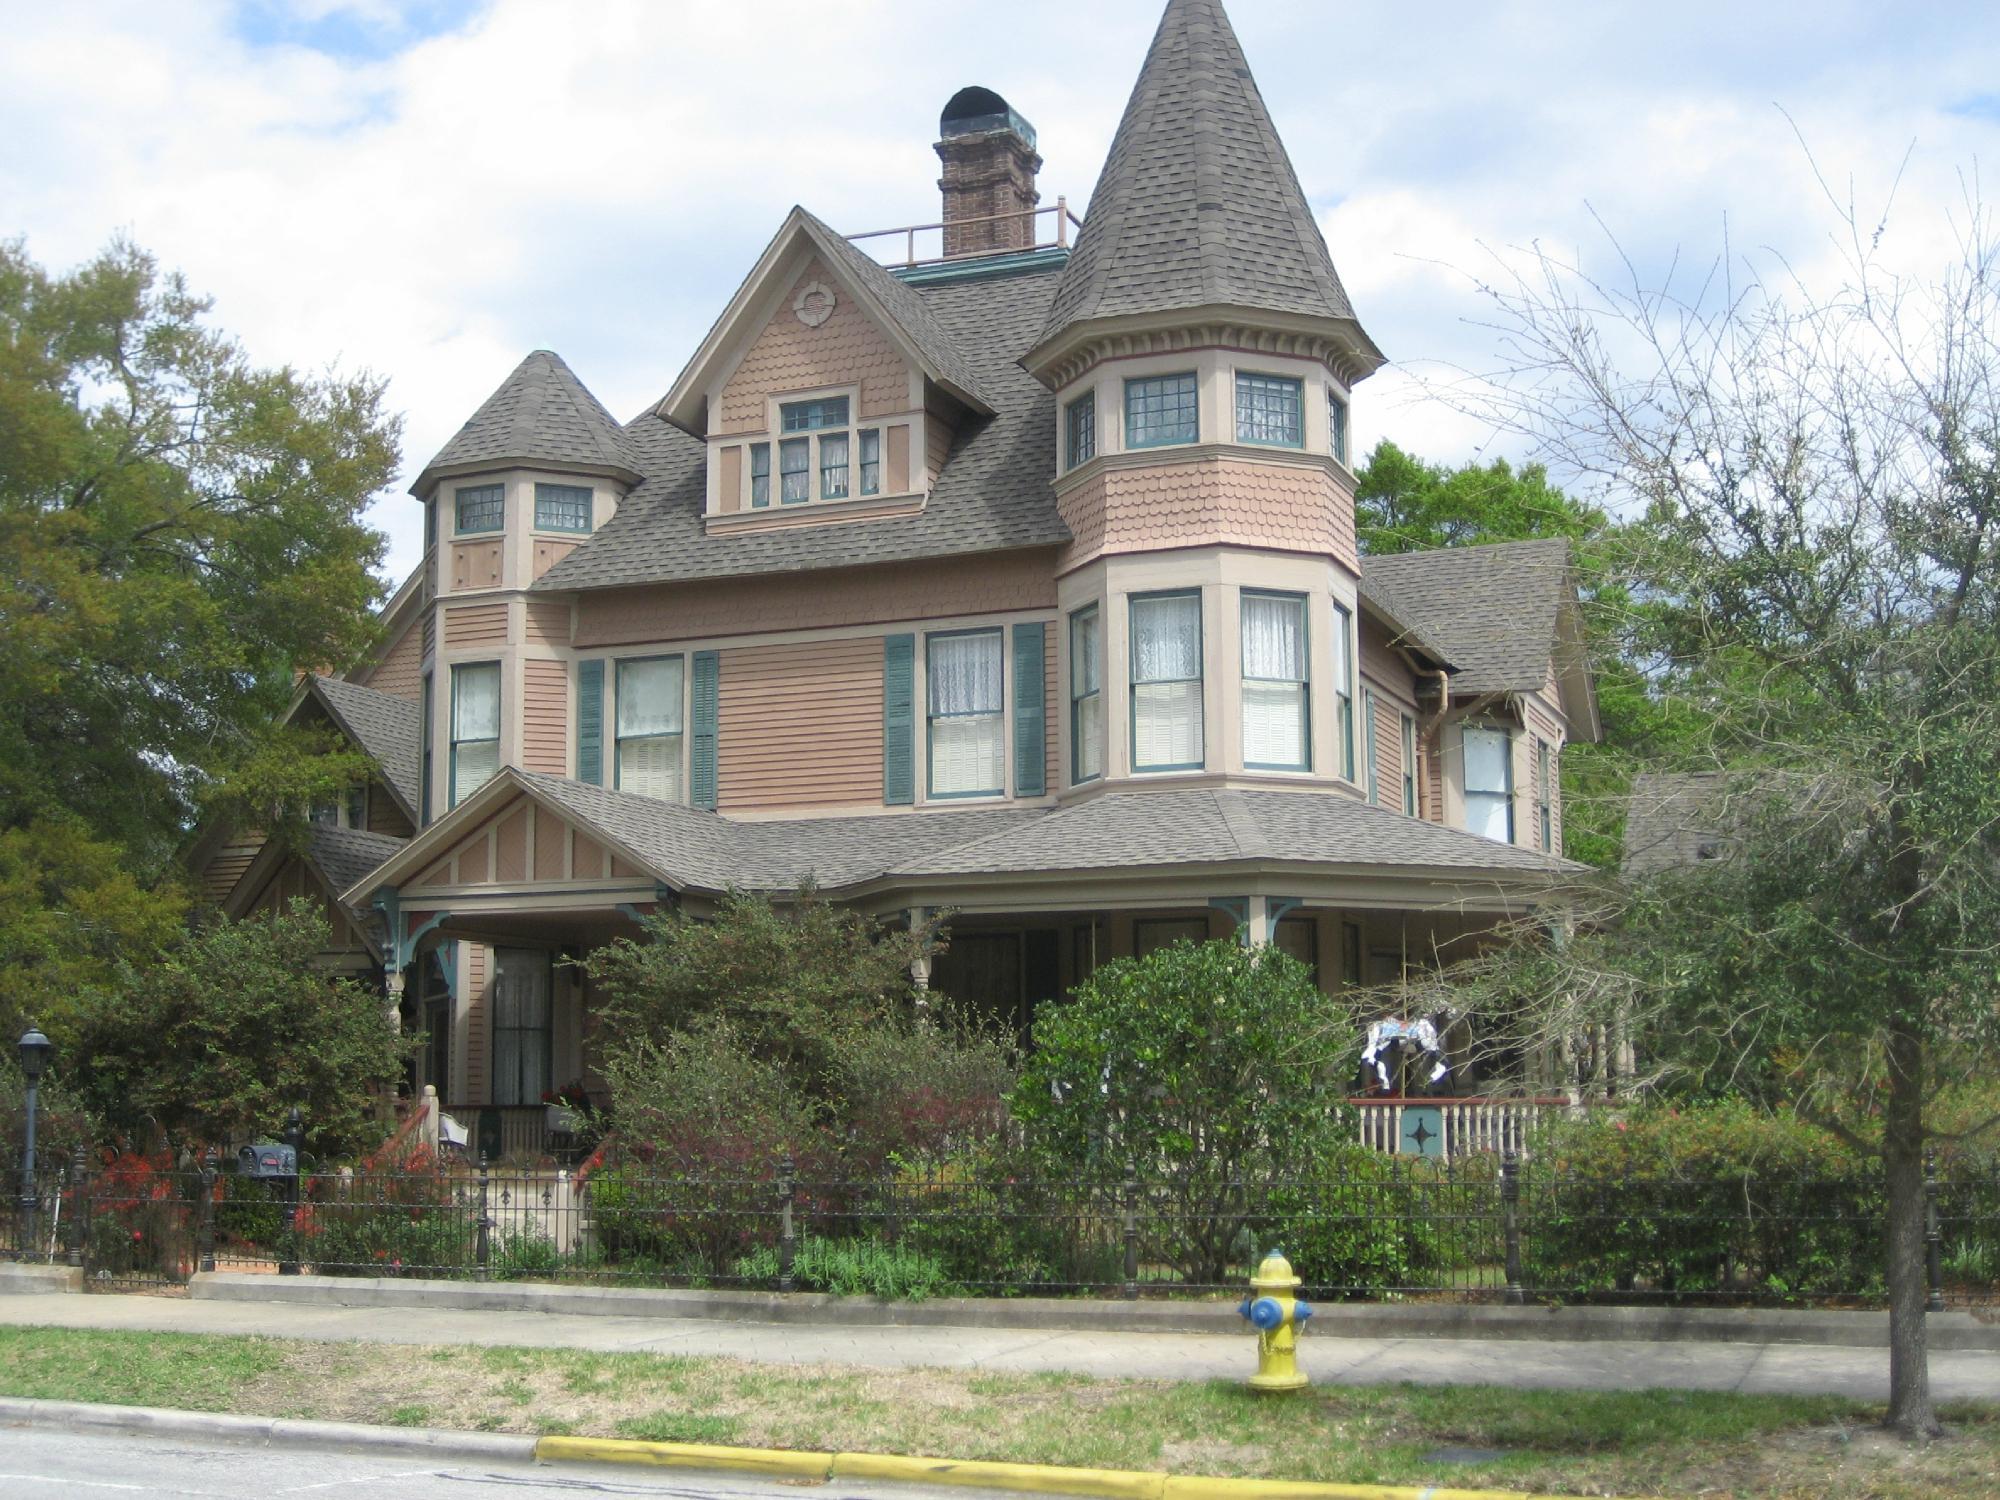 Bailey House, 1895, National Register